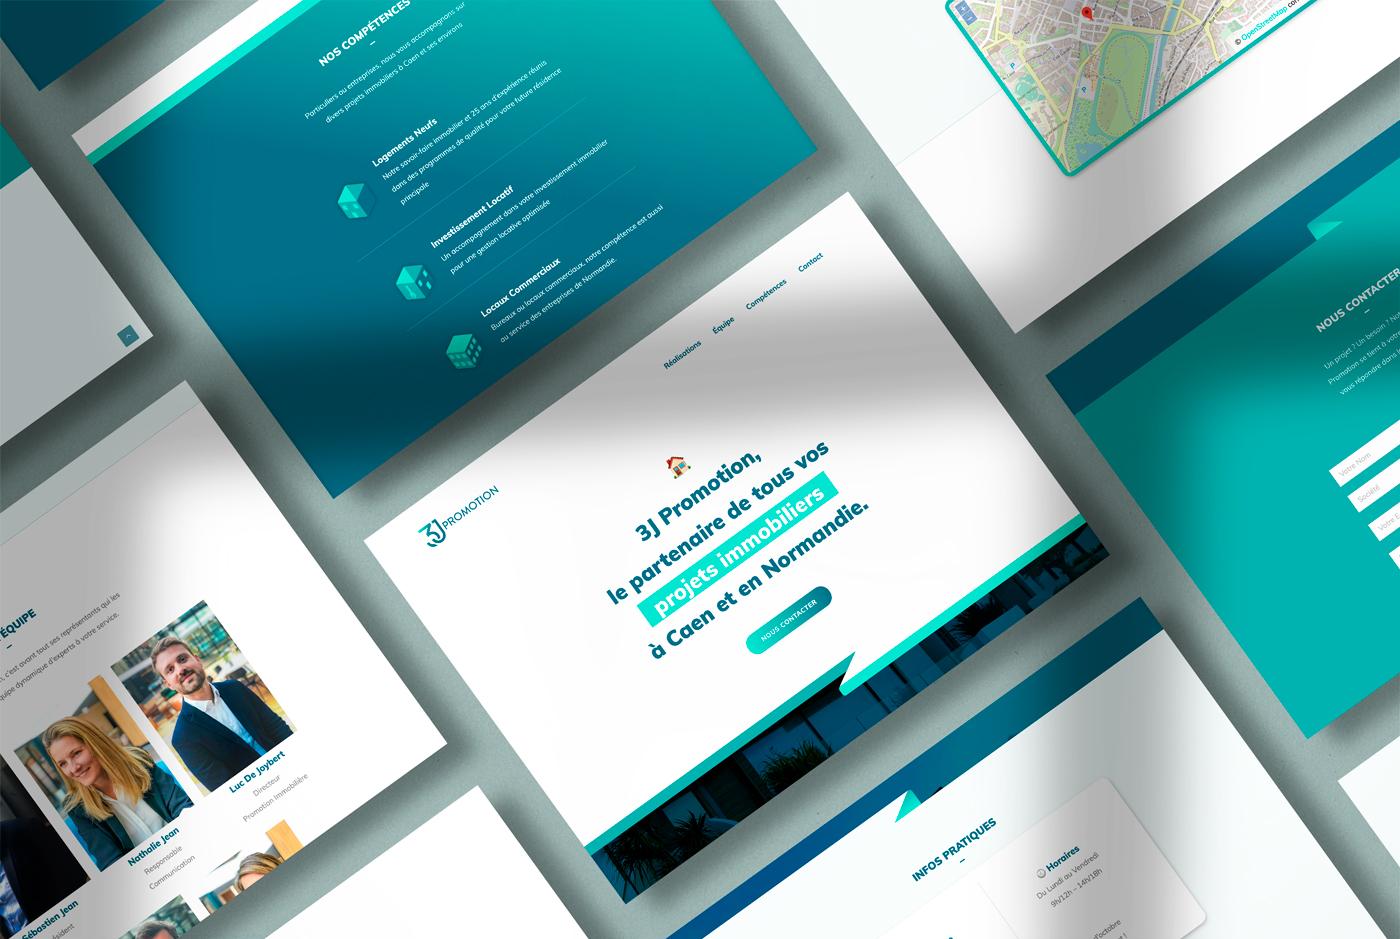 3J immobilier website desktop - mathieu Dupuis Freelance